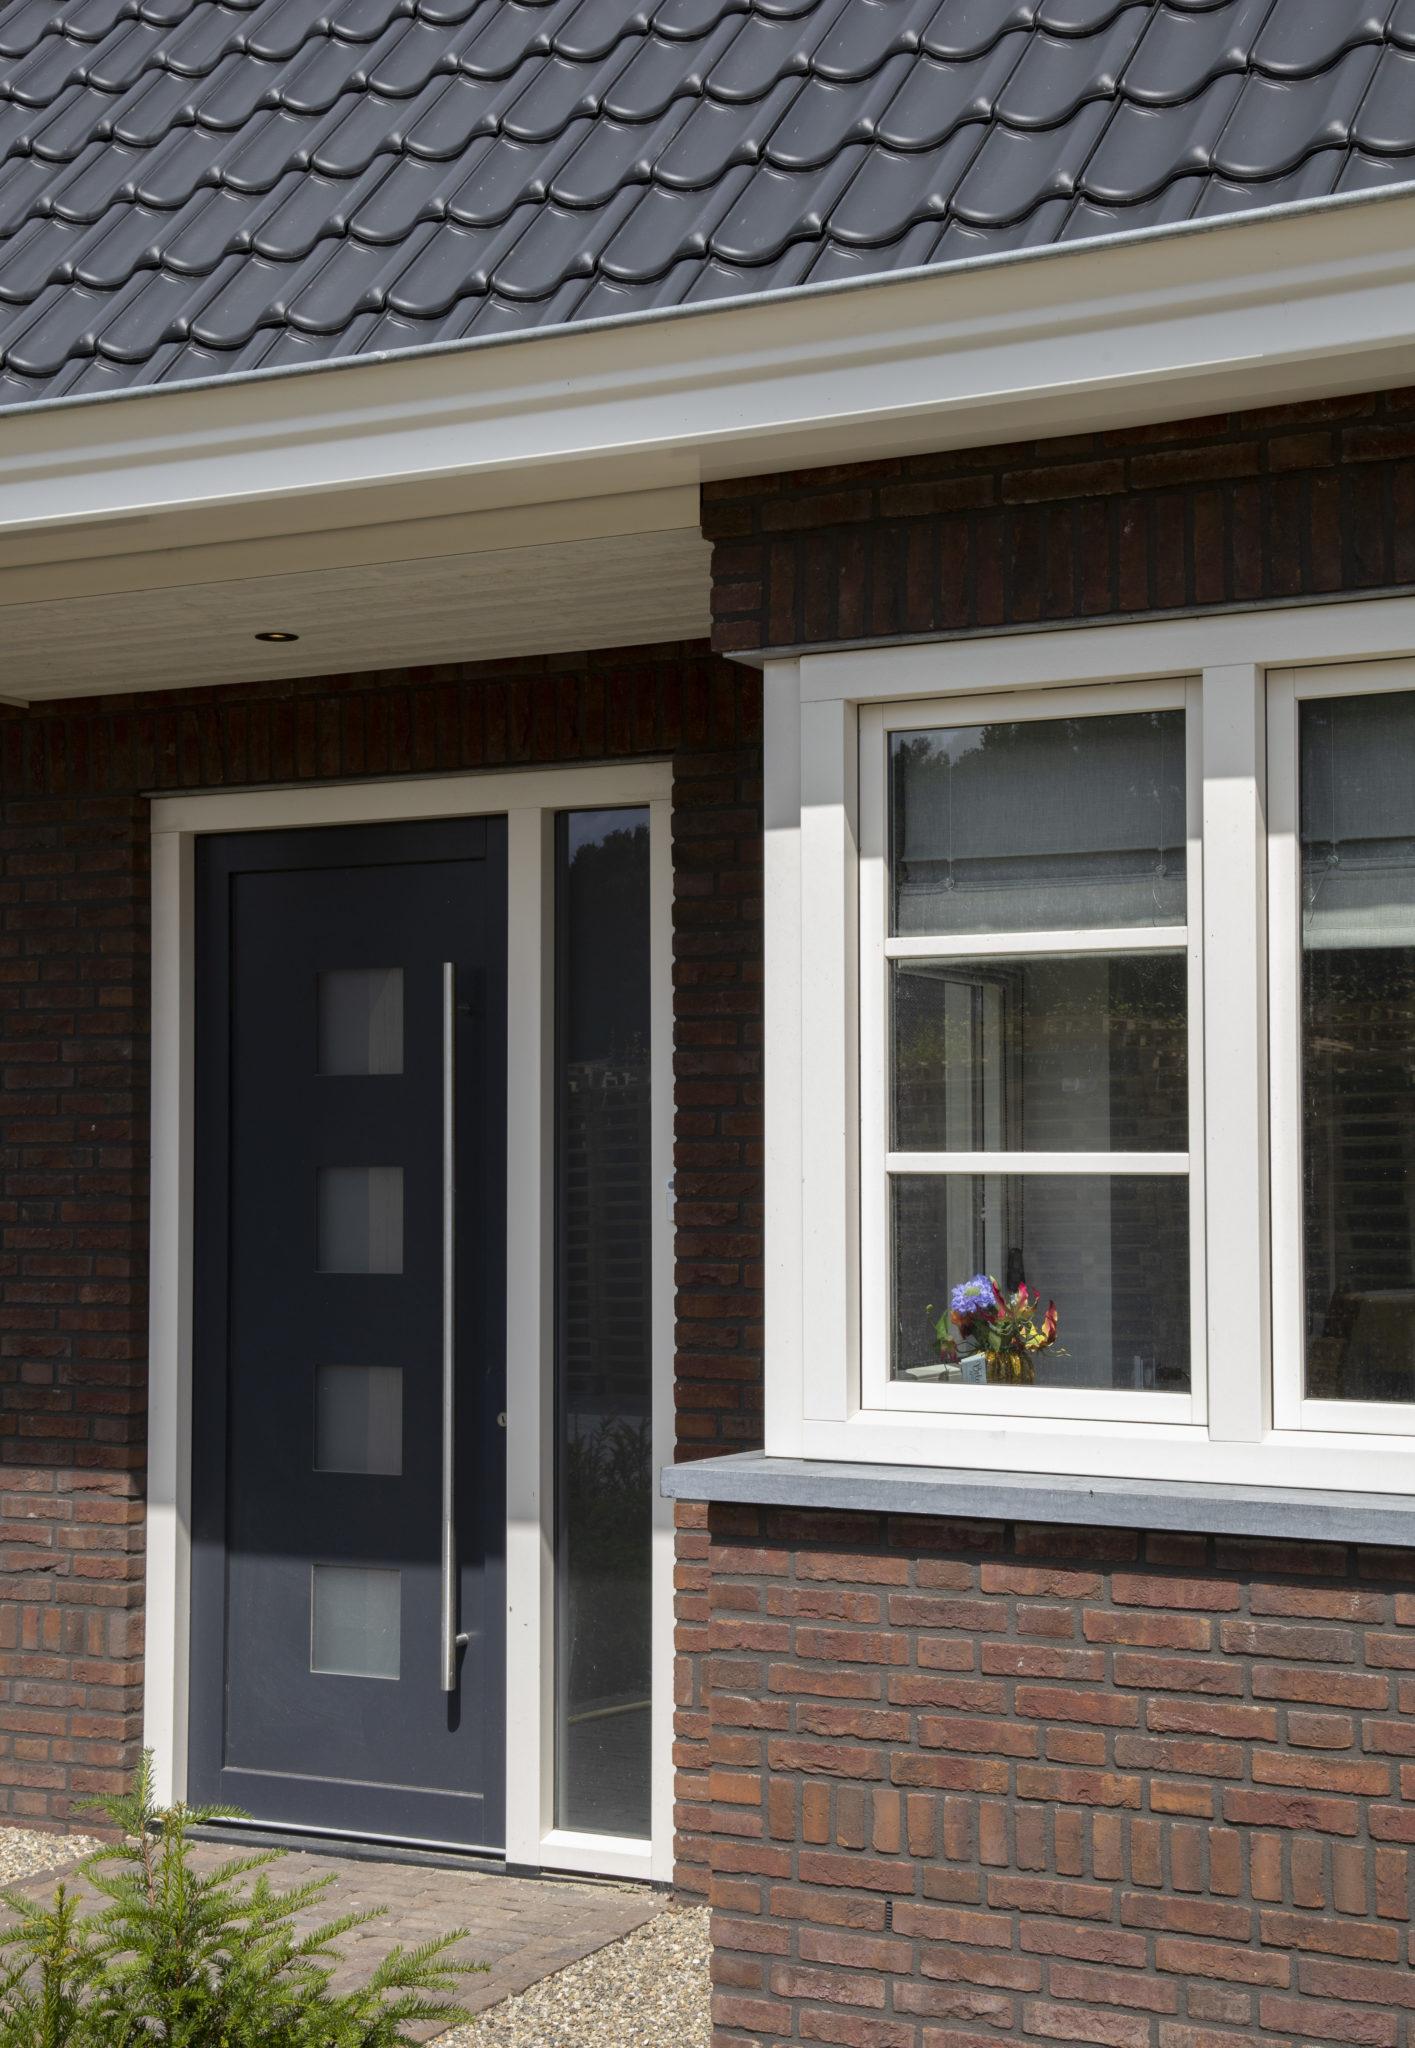 https://www.leonpeterskozijnen.nl/wp-content/uploads/2020/07/Leon20-scaled.jpg